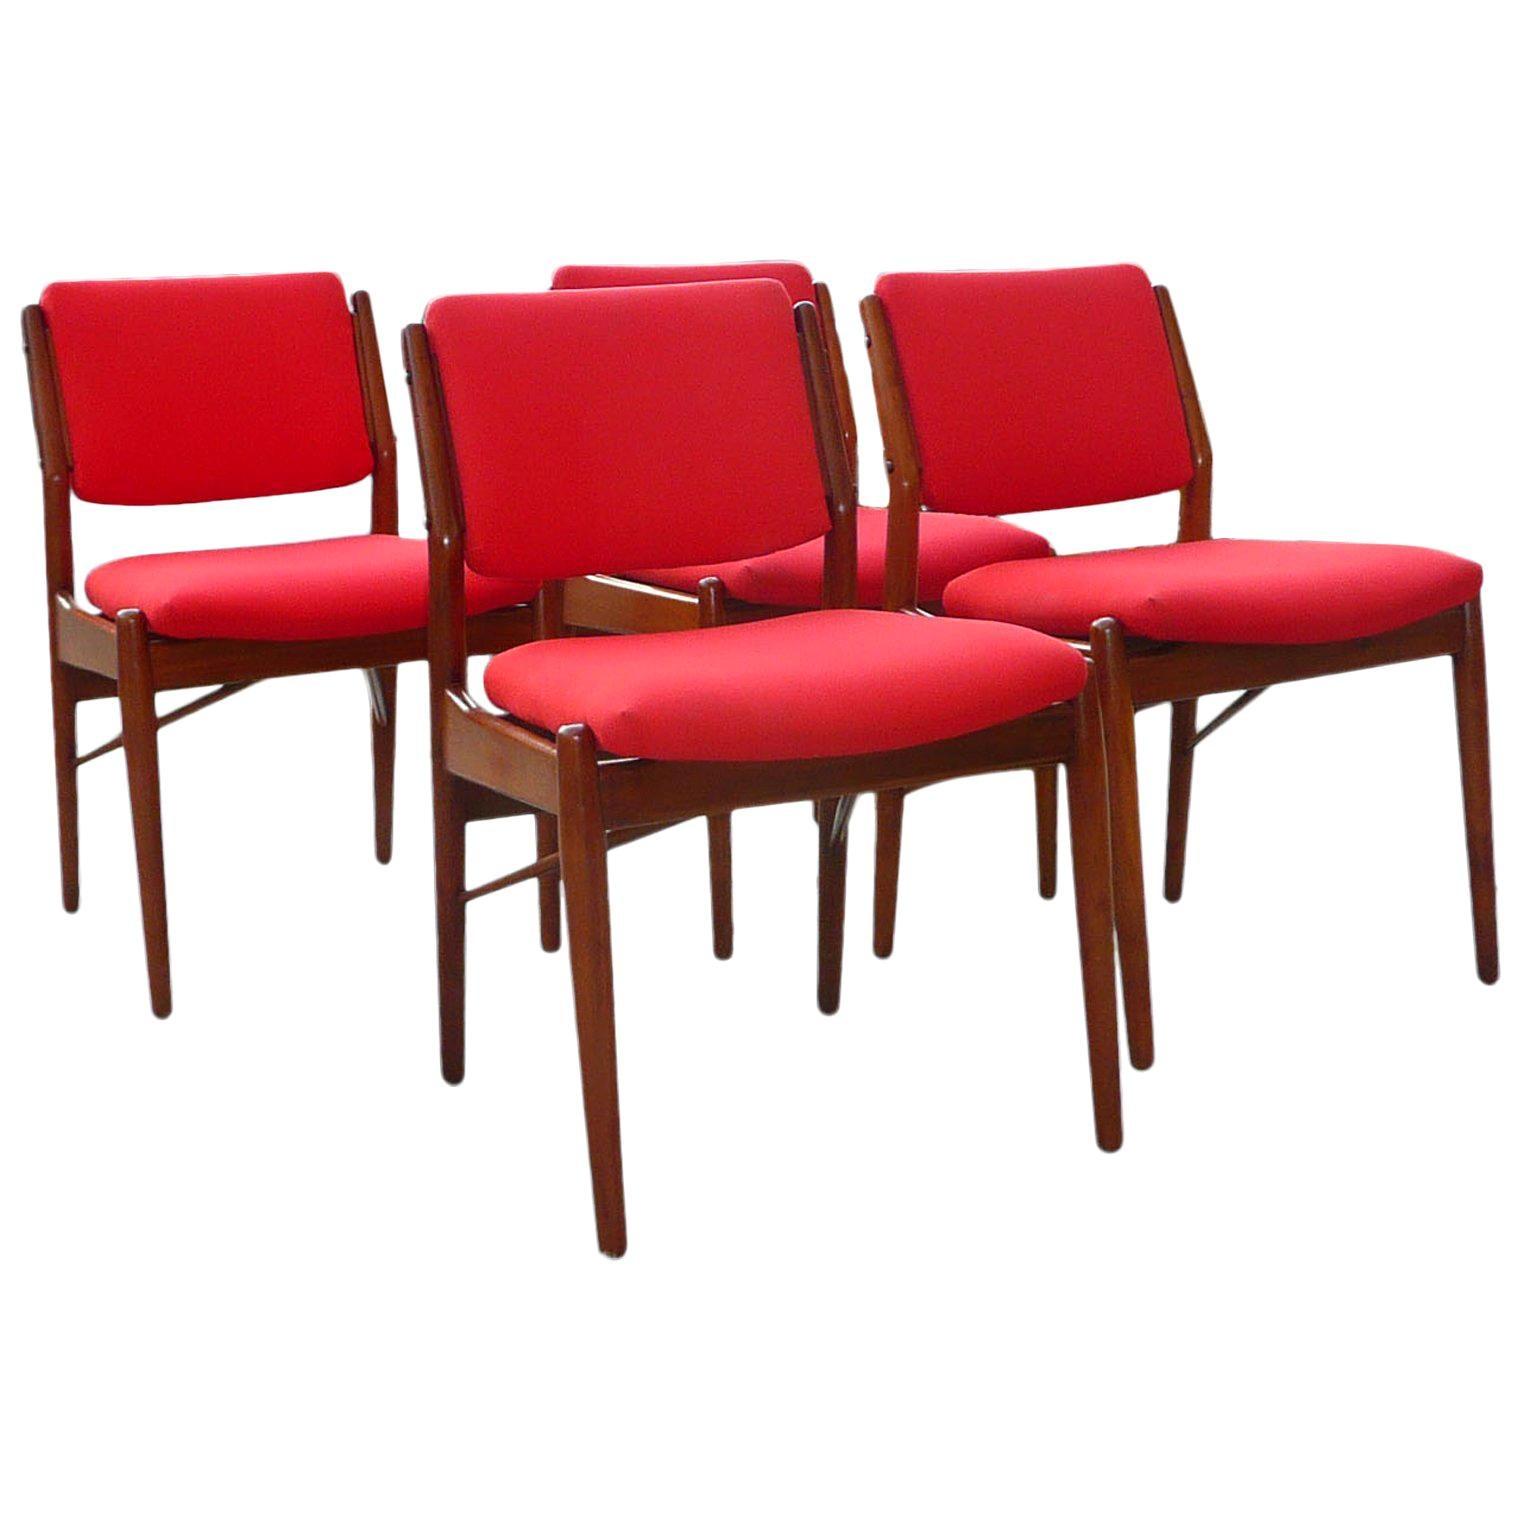 Teak Dining Chairs by Arne Vodder for Sibast Mobler